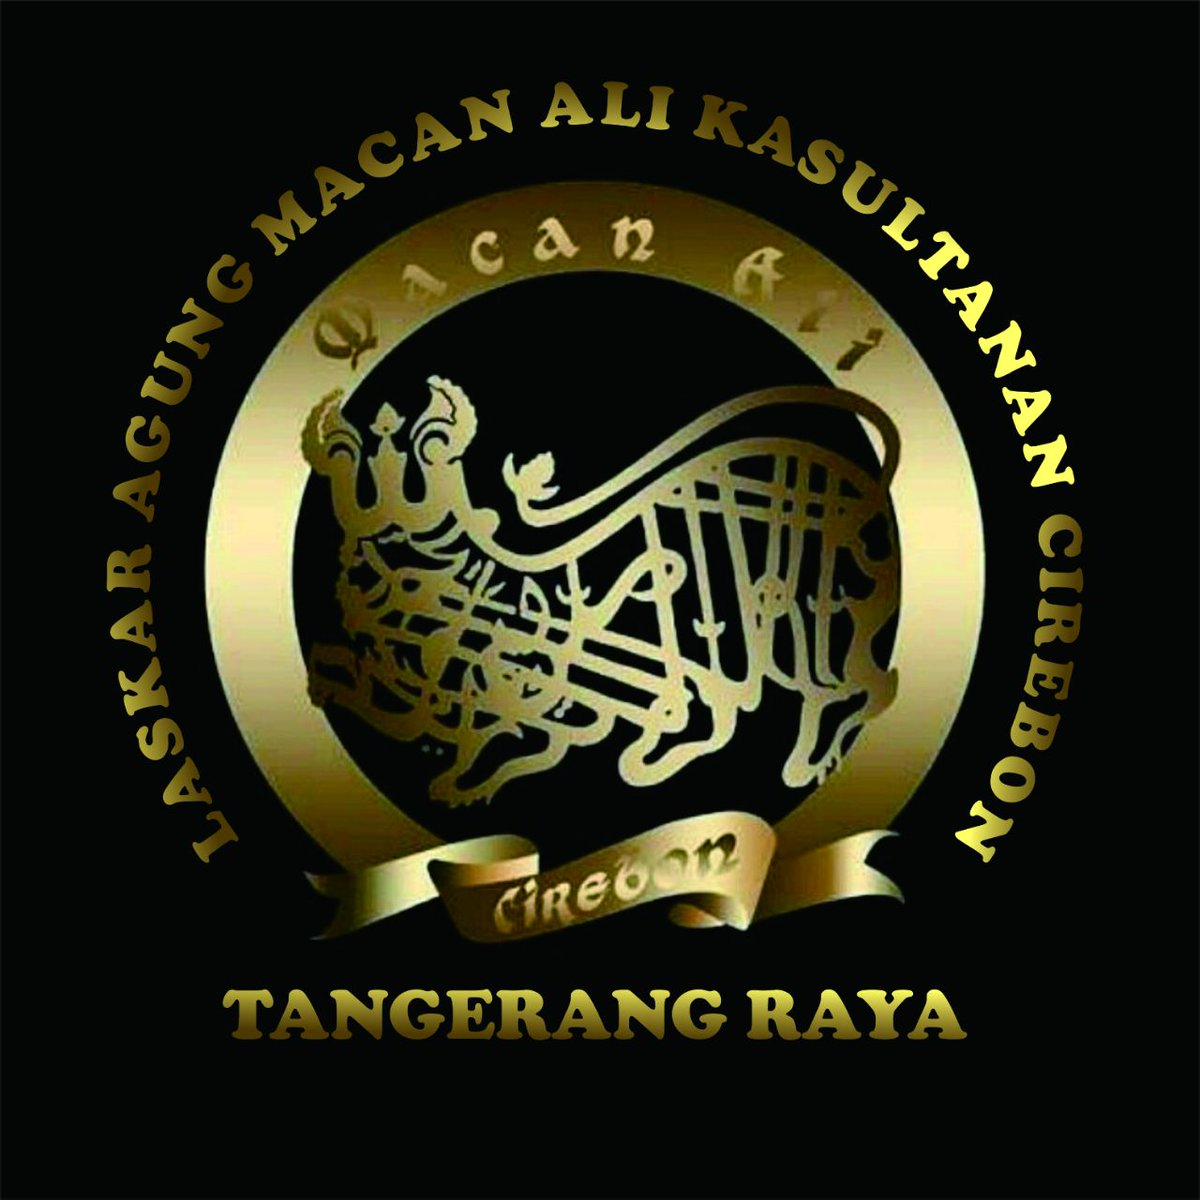 Gambar Logo Macan Ali Laskar Macan Ali Tangerang Raya A Twitter Fotoprofilbaru